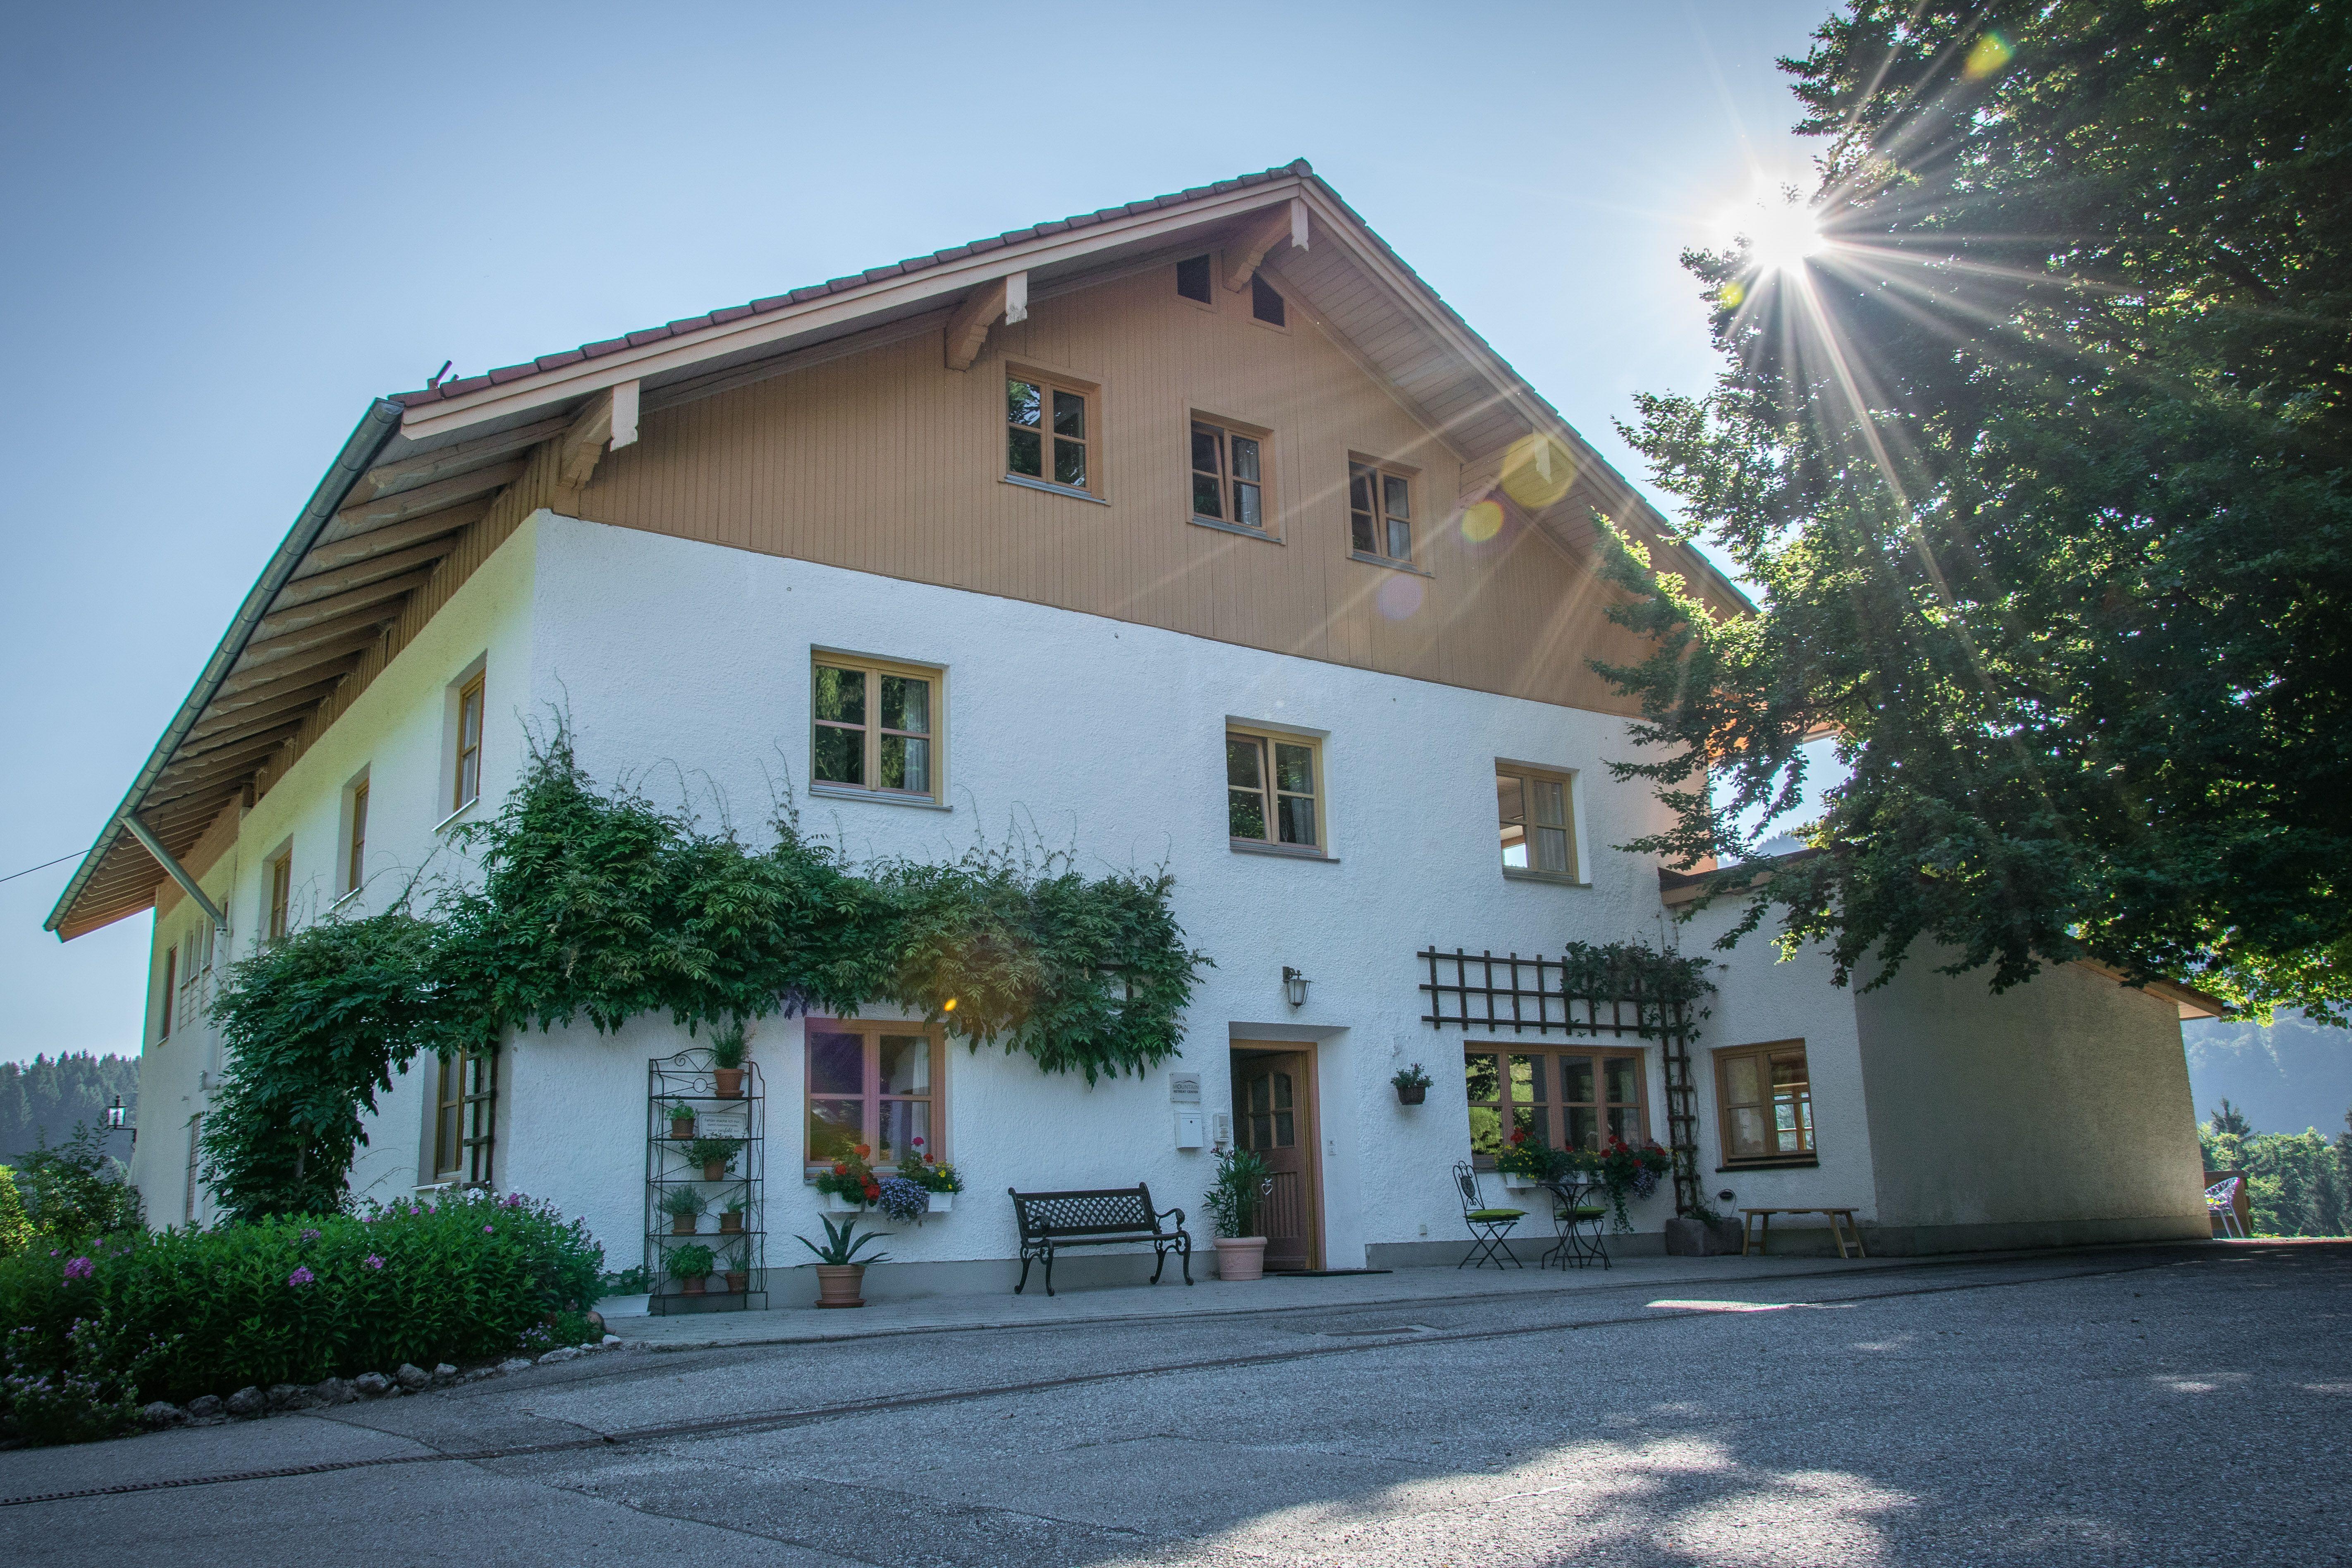 Indigourlaub_Mountain_Retreat_Center_Image_18_copyright_Daniel_Maier